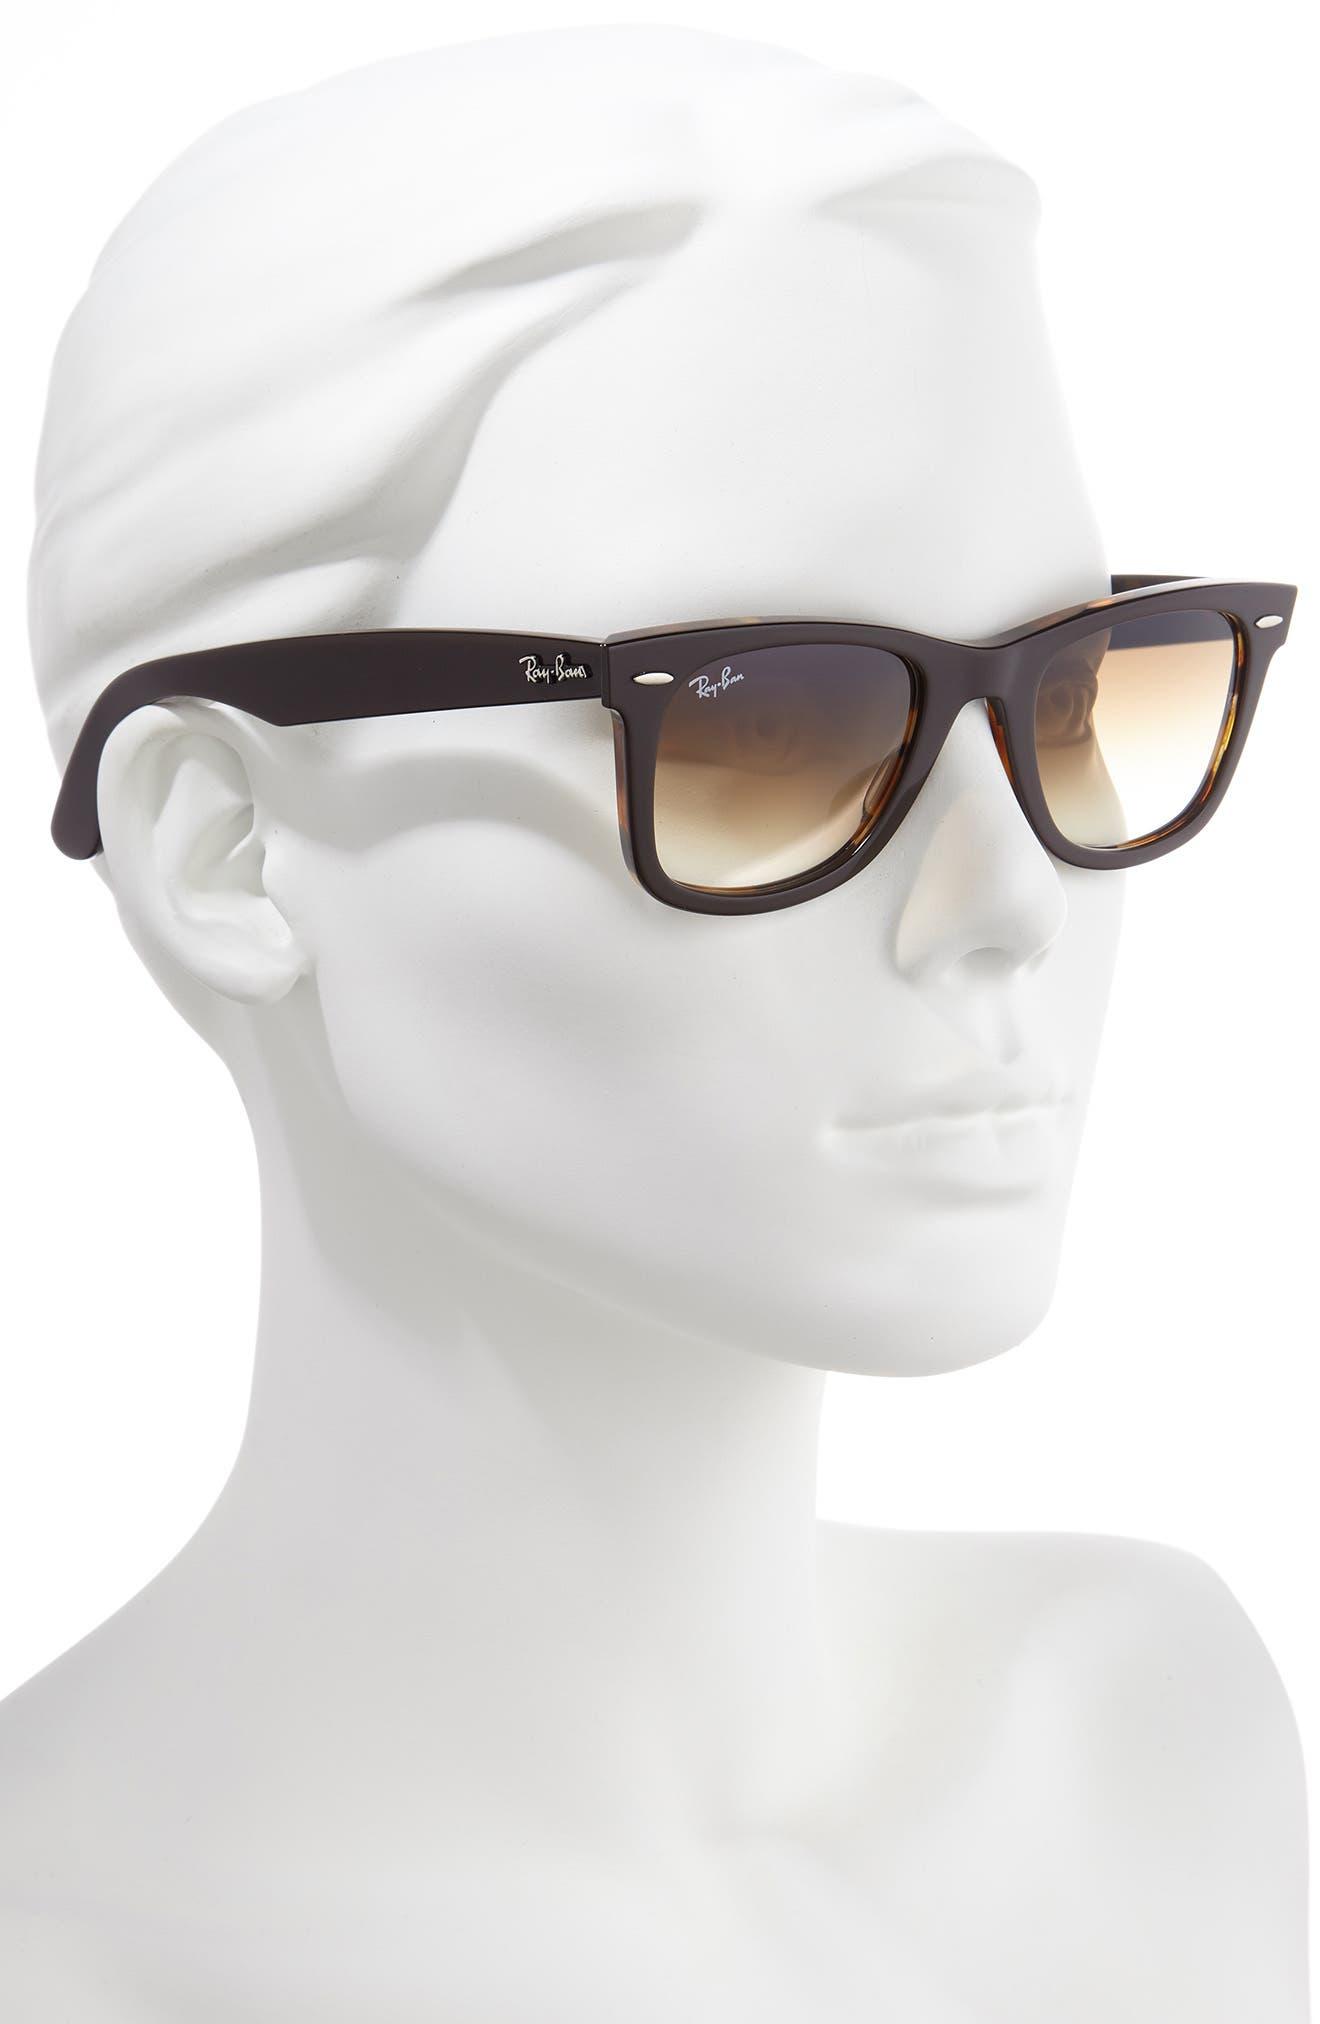 82802e825d5f5 Ray-Ban Wayfarer Sunglasses